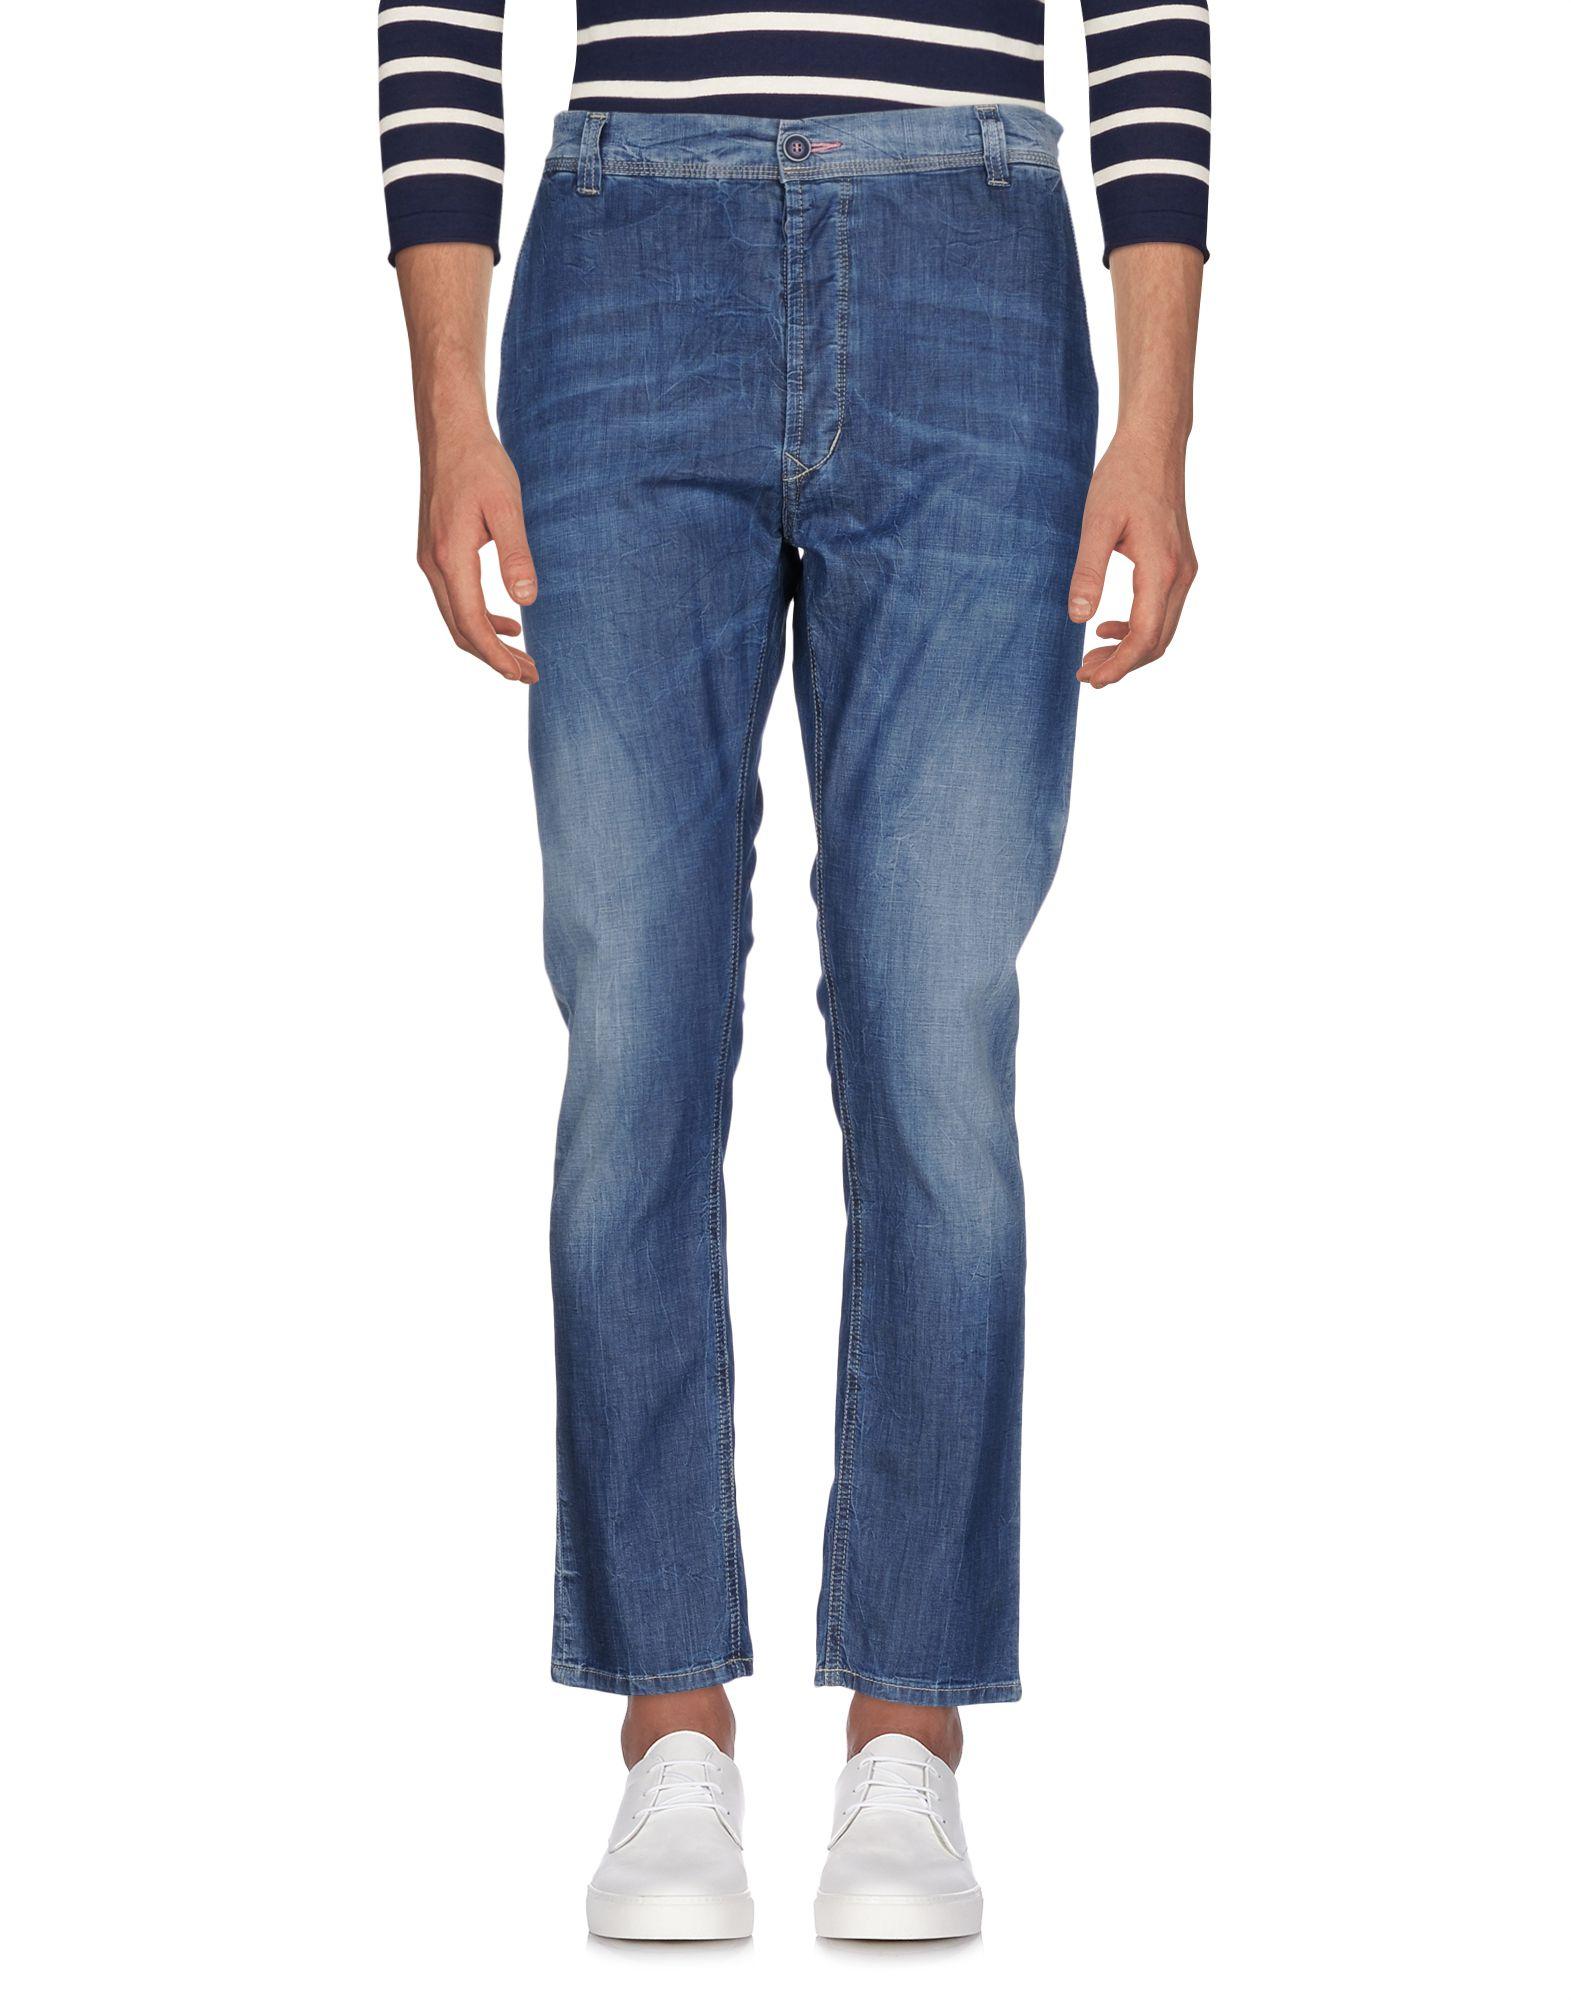 Pantaloni Daniele Jeans Daniele Pantaloni Alessandrini Uomo - 42639902RD 33bad9